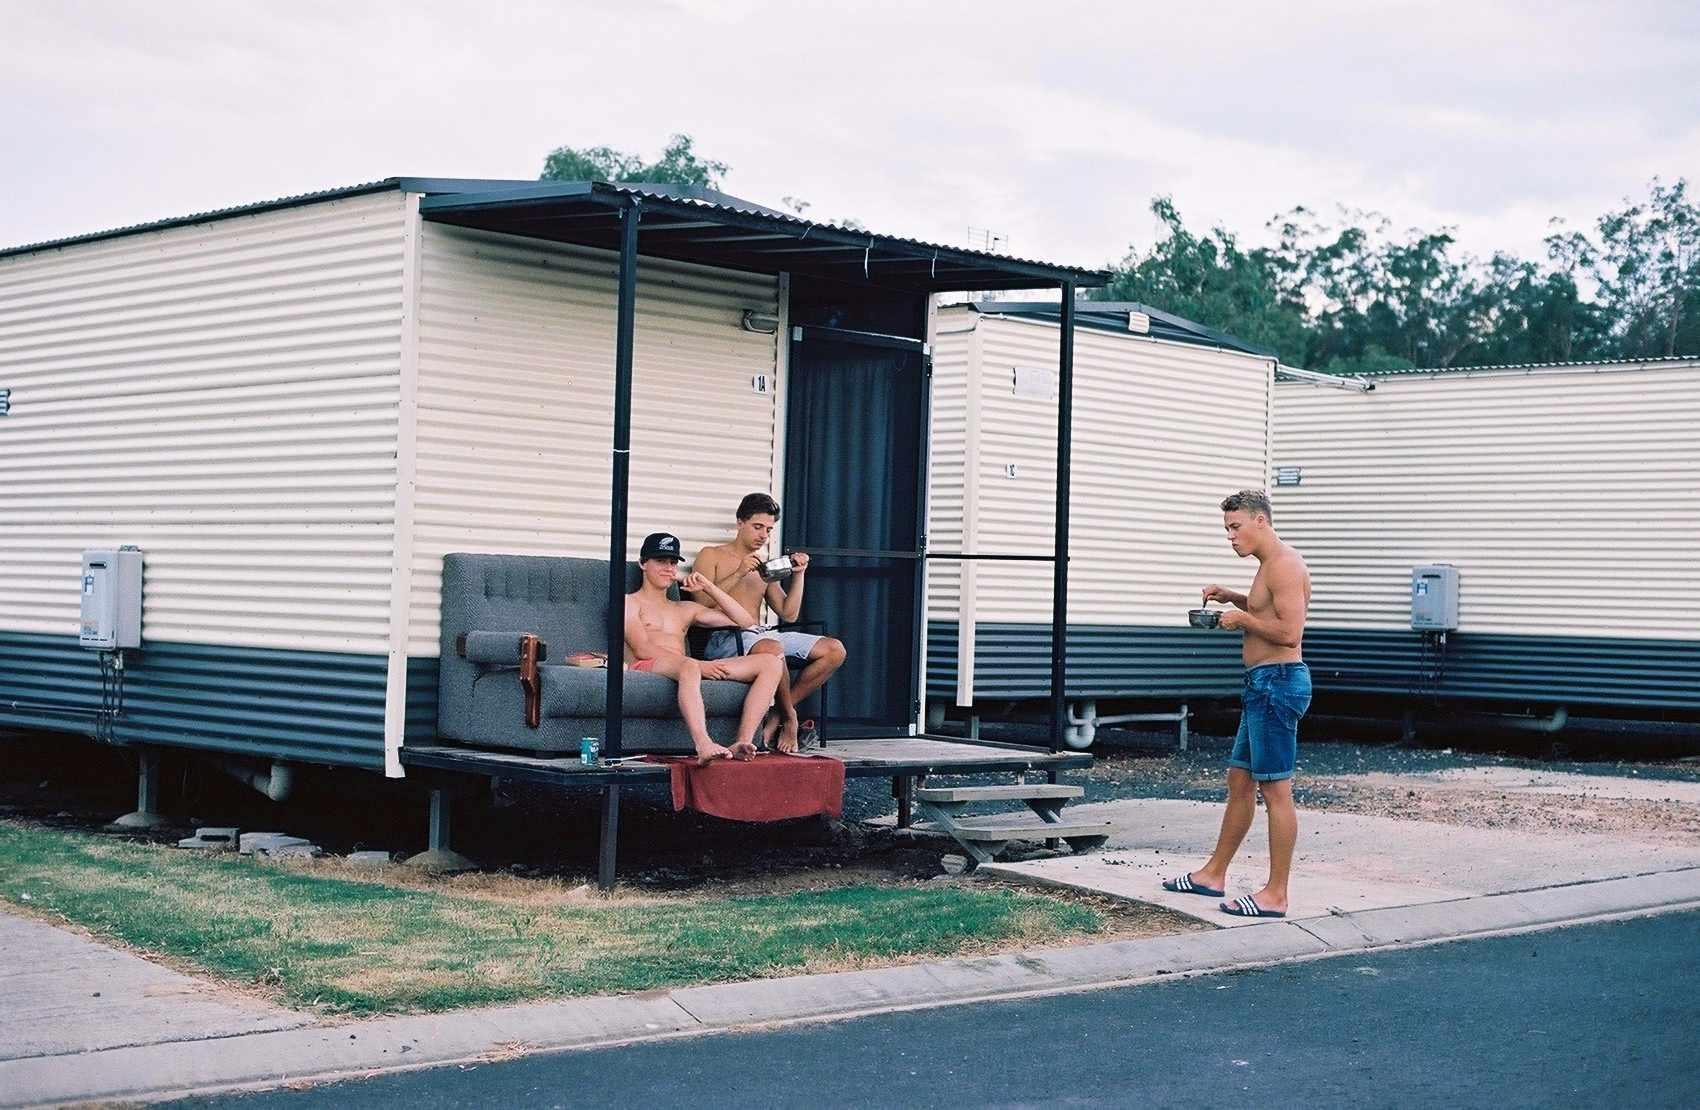 Rändurid Austraalias. Foto: Patrik Tamm